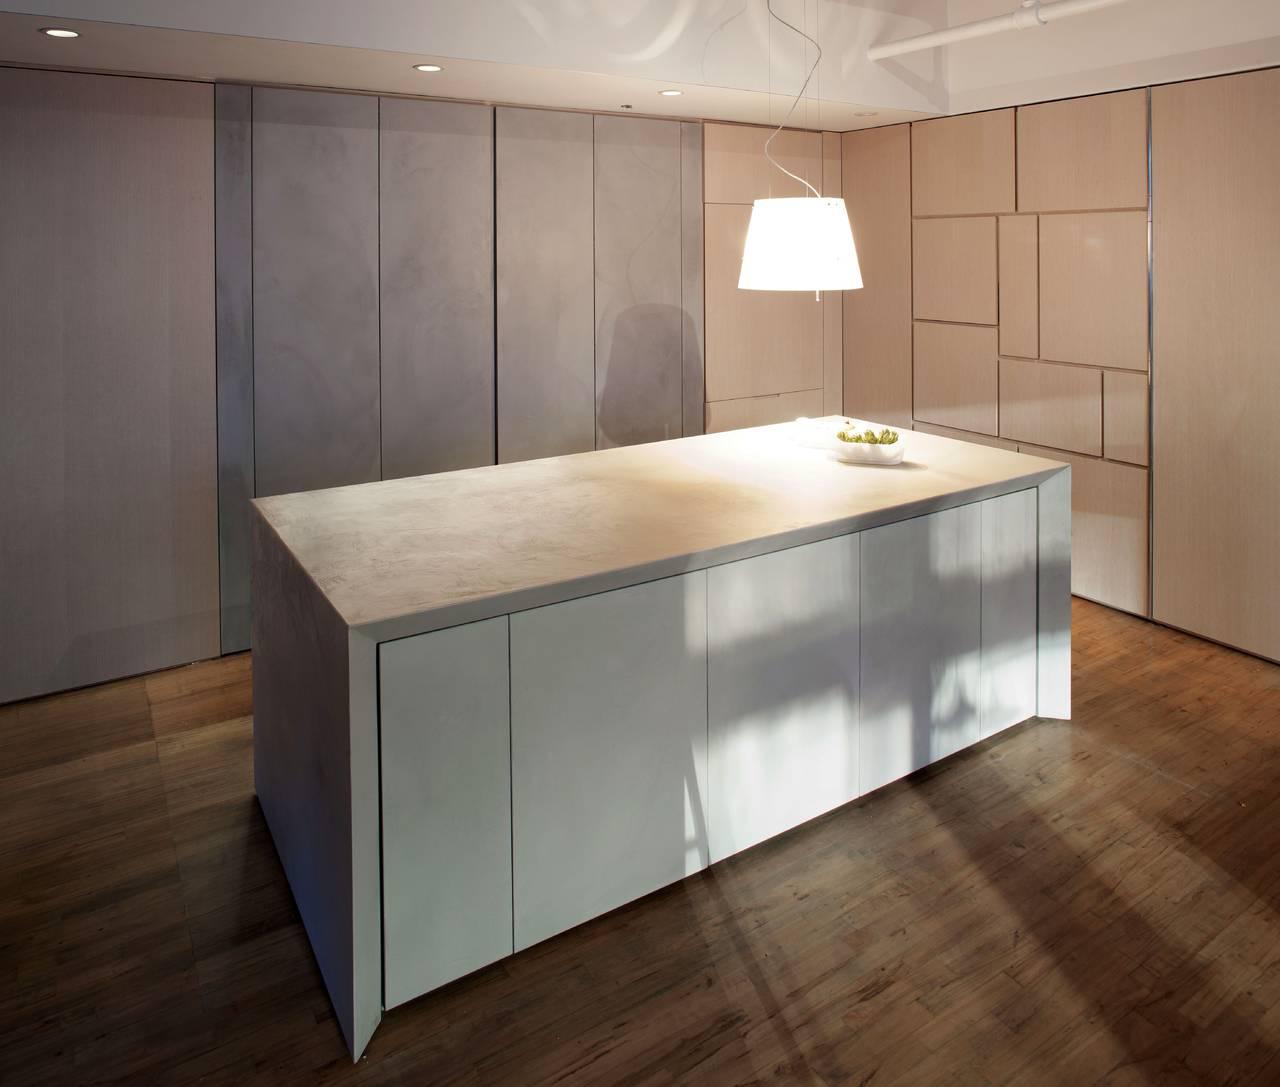 Cucina su misura design apart a new york ambiente cucina - Piano cucina su misura ...